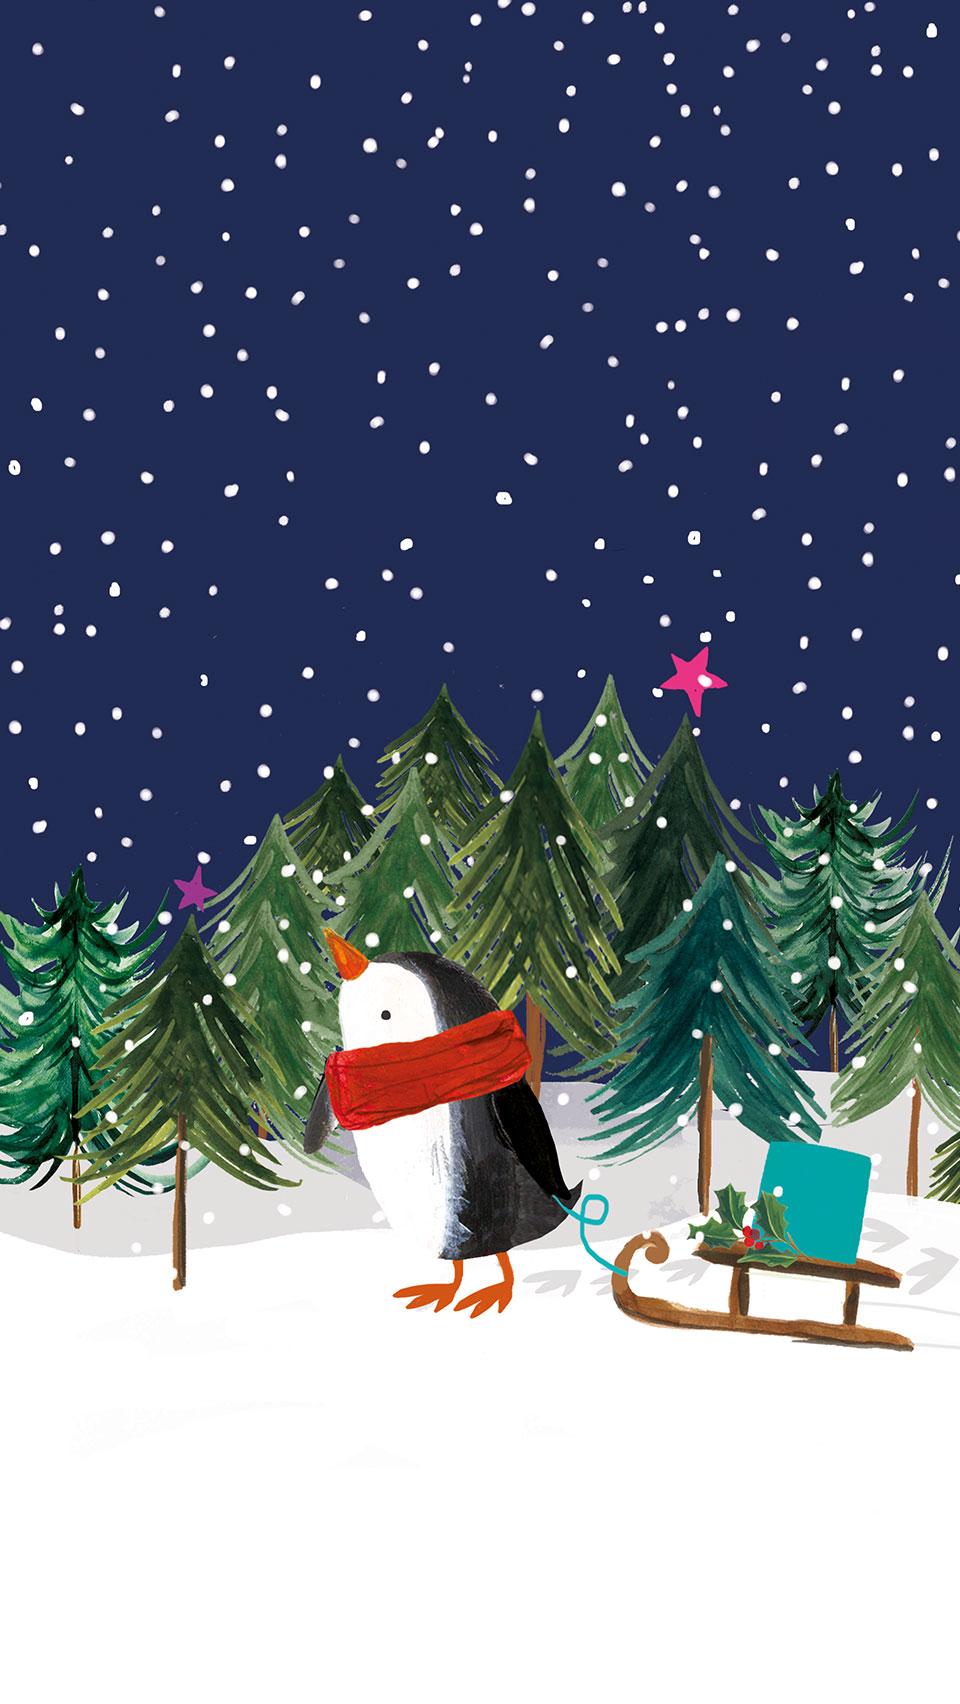 Free Digital Mobile Wallpapers Free Download Caroline Gardner Free Digital Christmas Cards Wallpaper Free Download Christmas Art